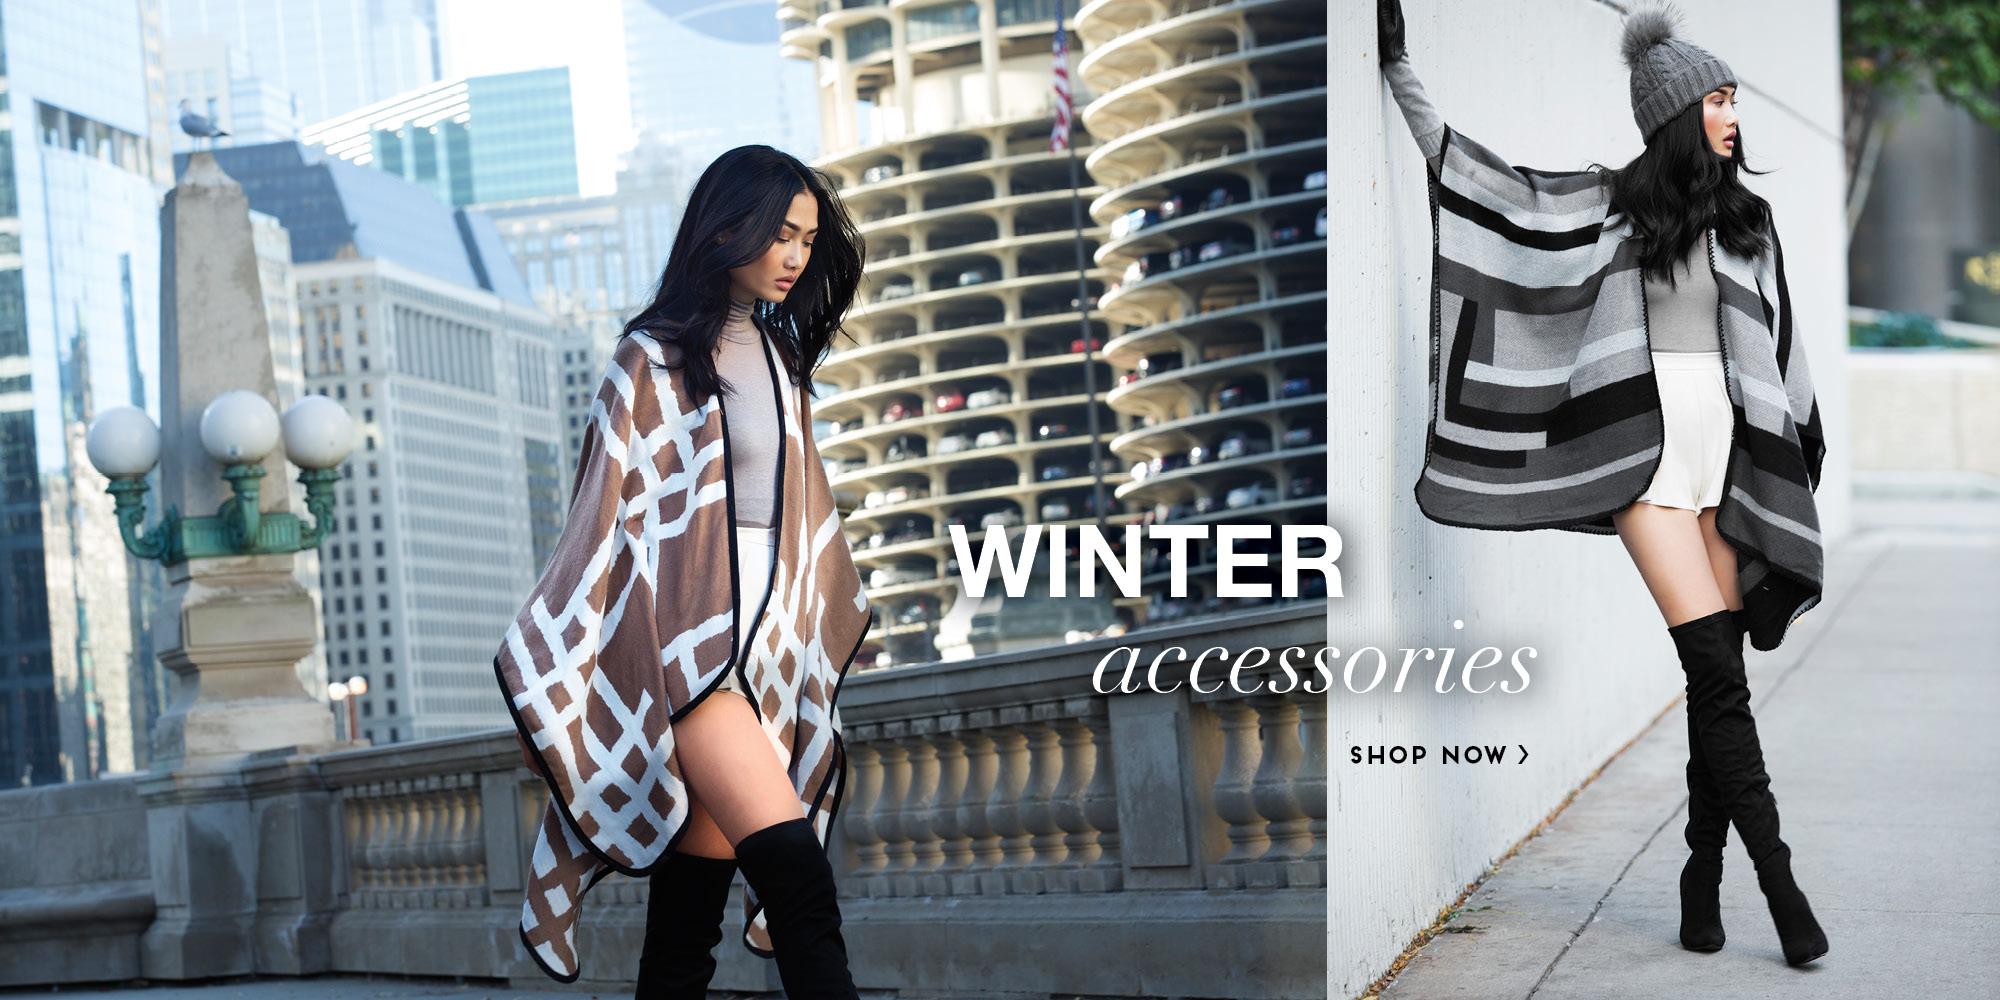 Click to Shop Winter Accessories